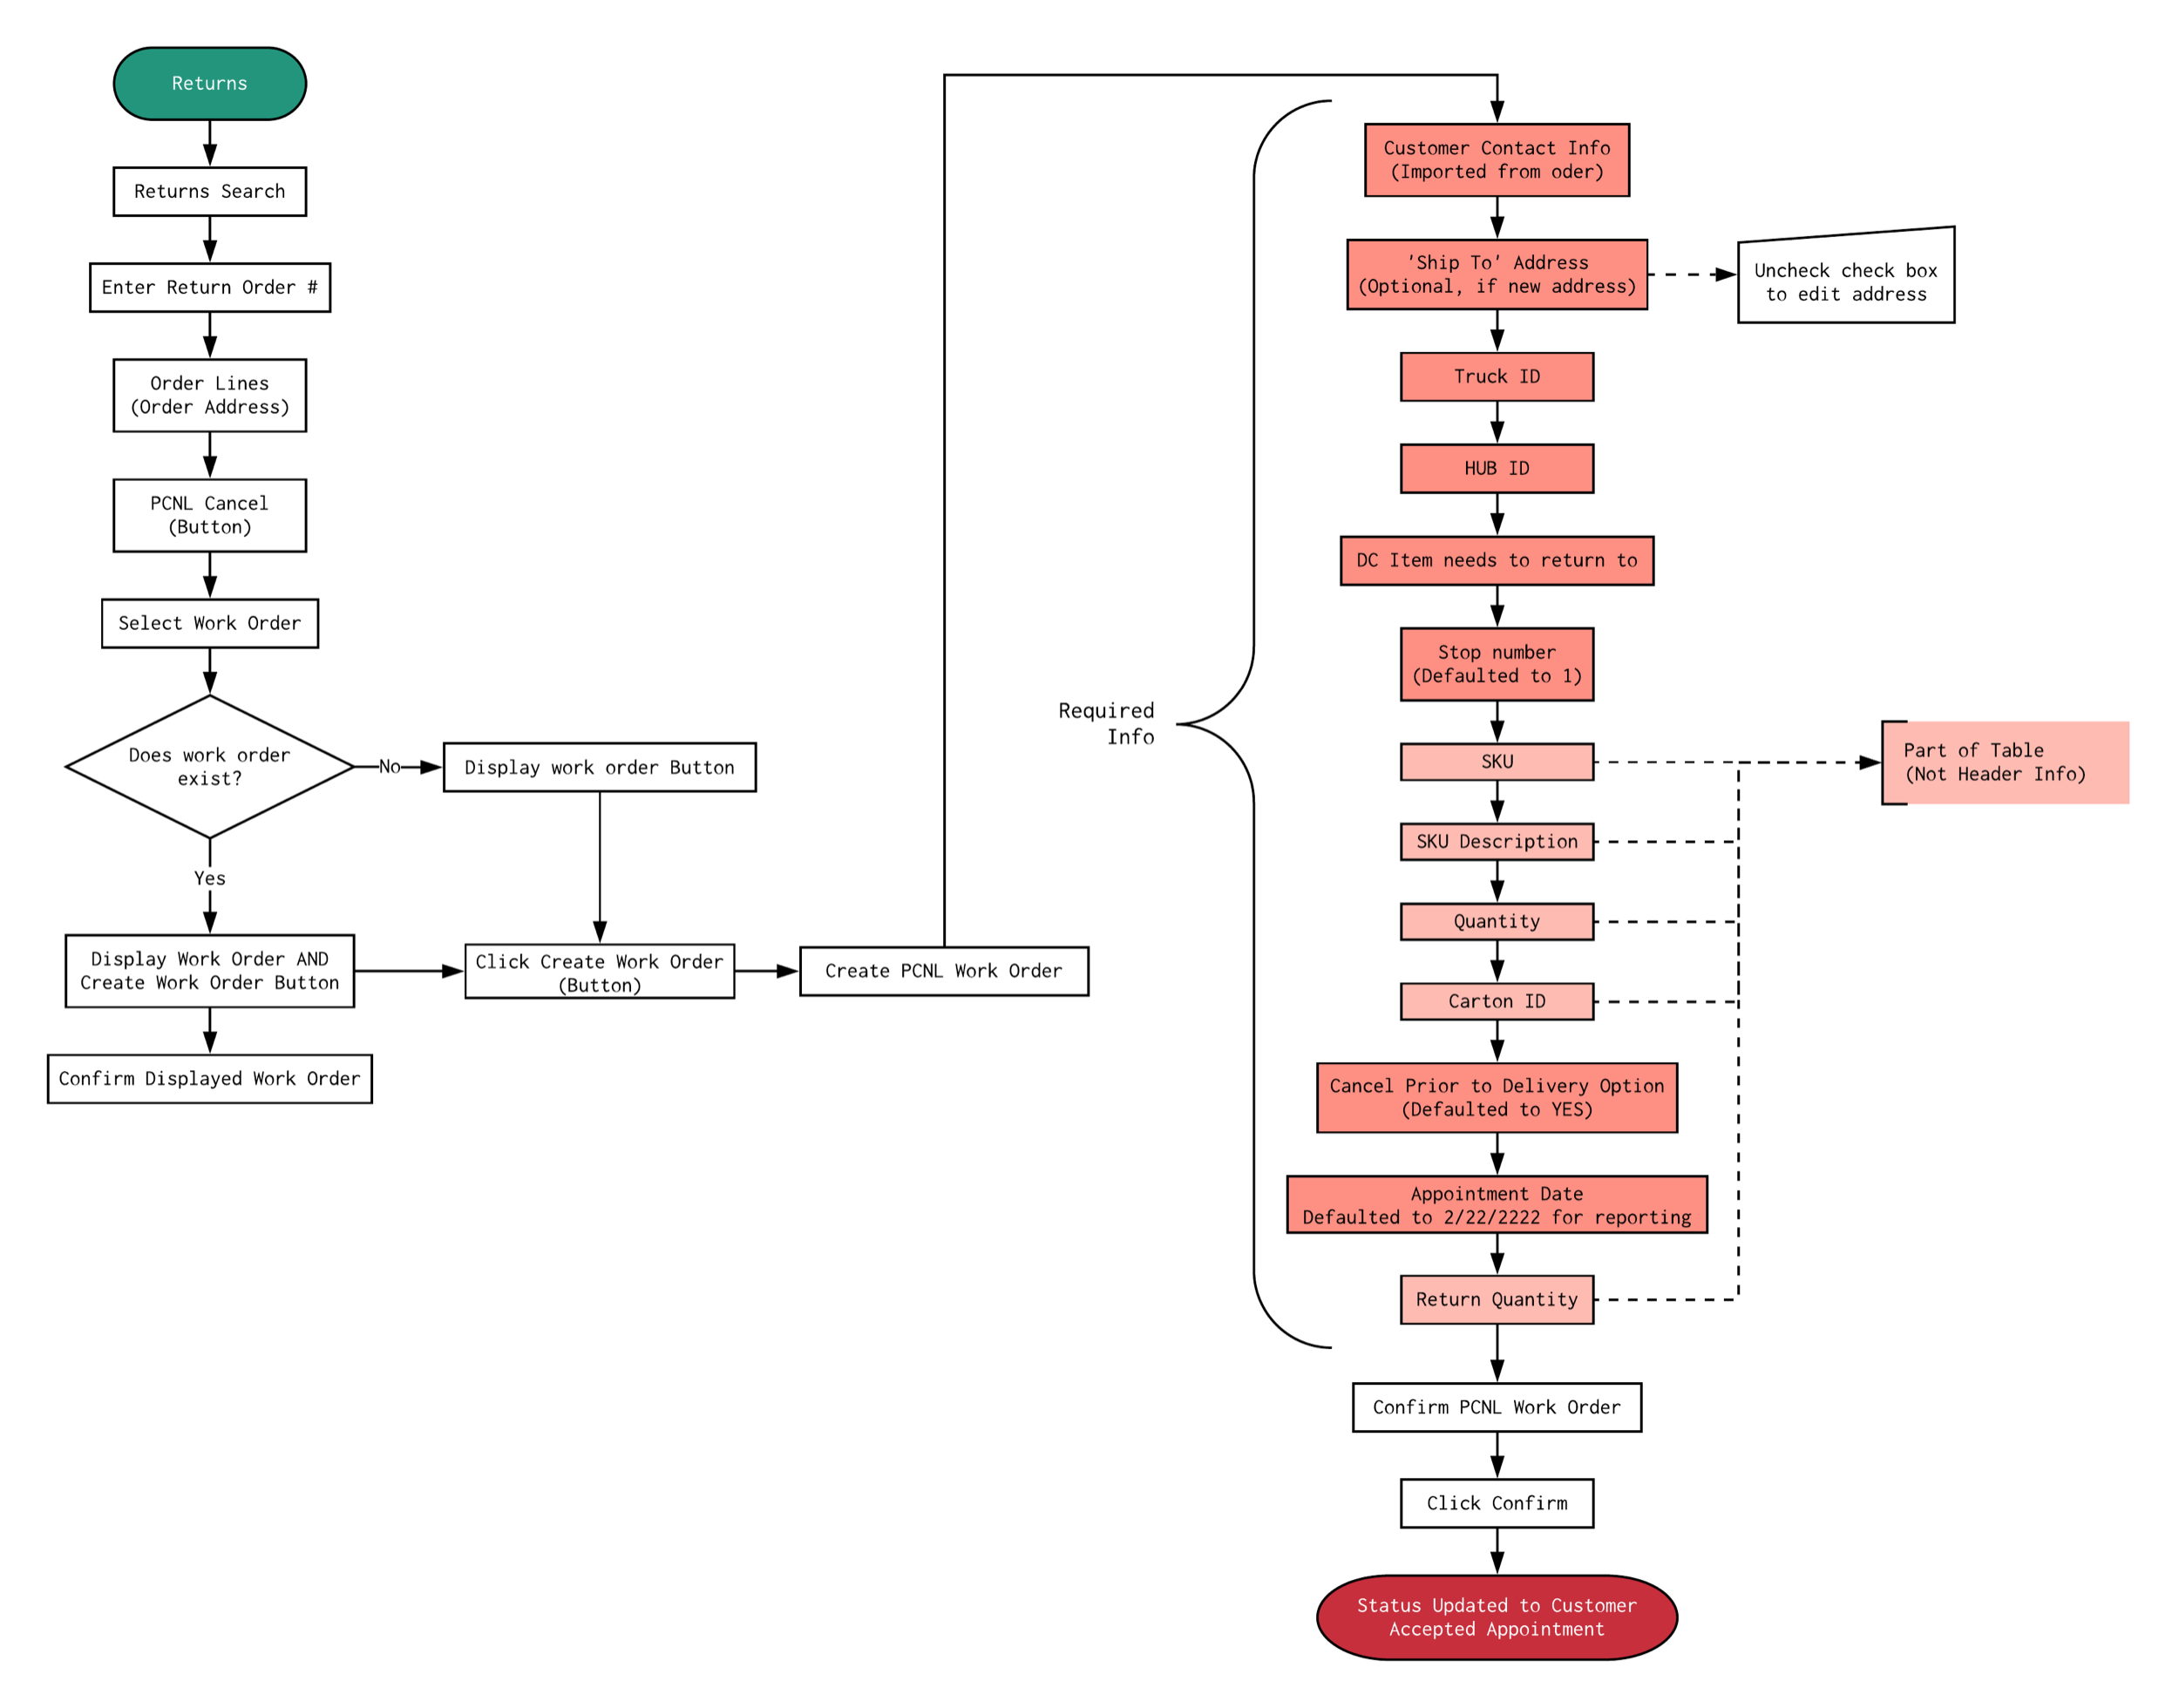 CCUI - PCNL Work Order Step 1 Flow